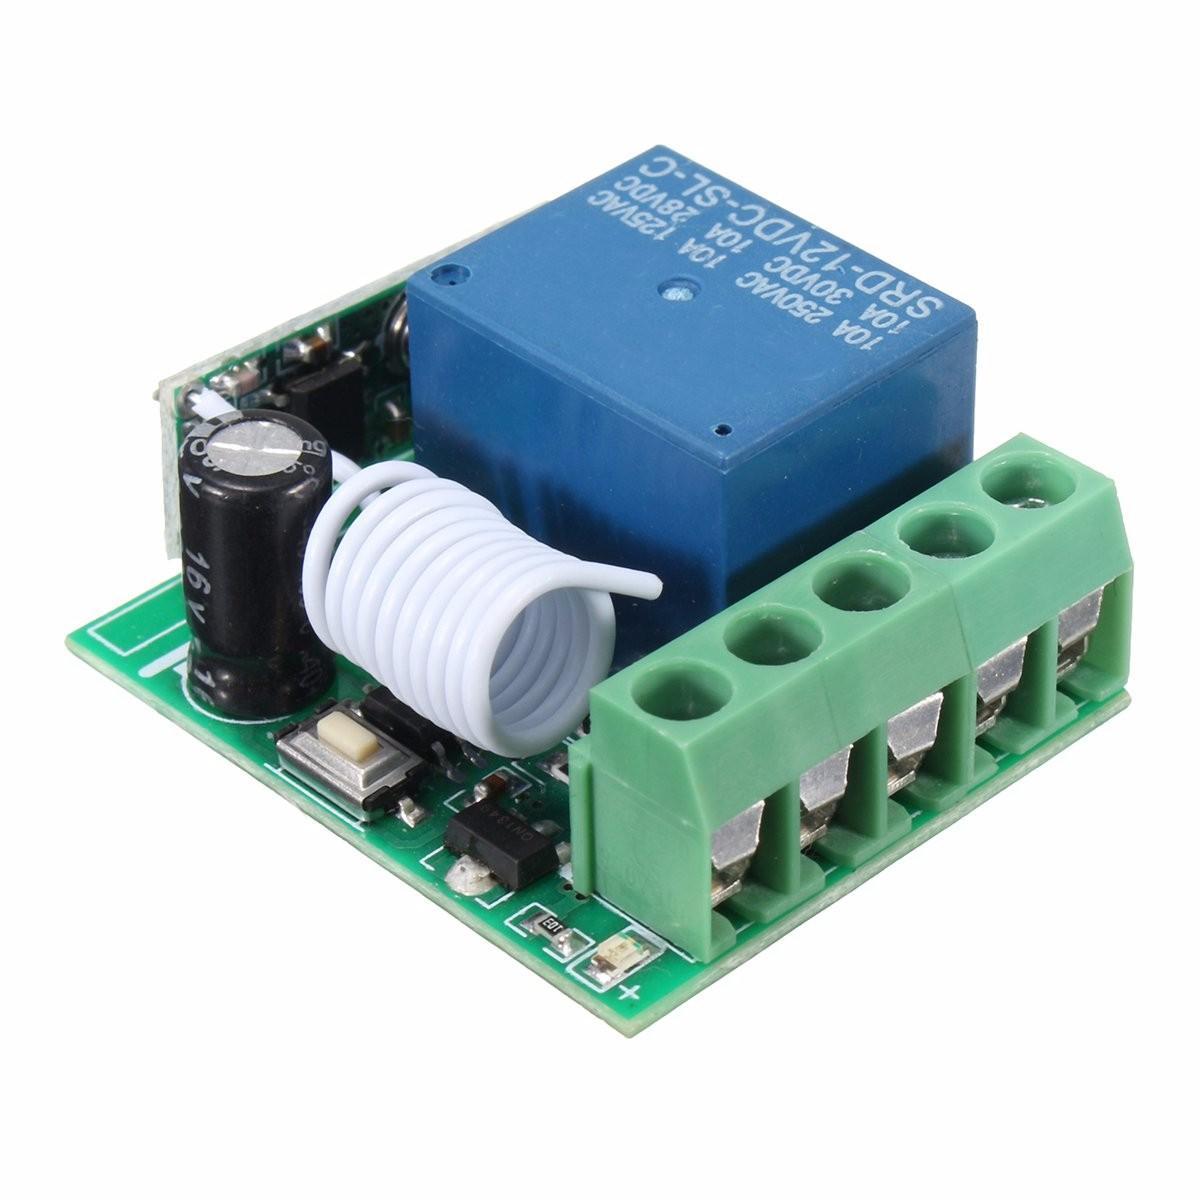 DC 12v 10A relay 1CH wireless RF Remote Control Switch Transmitter Receiver car